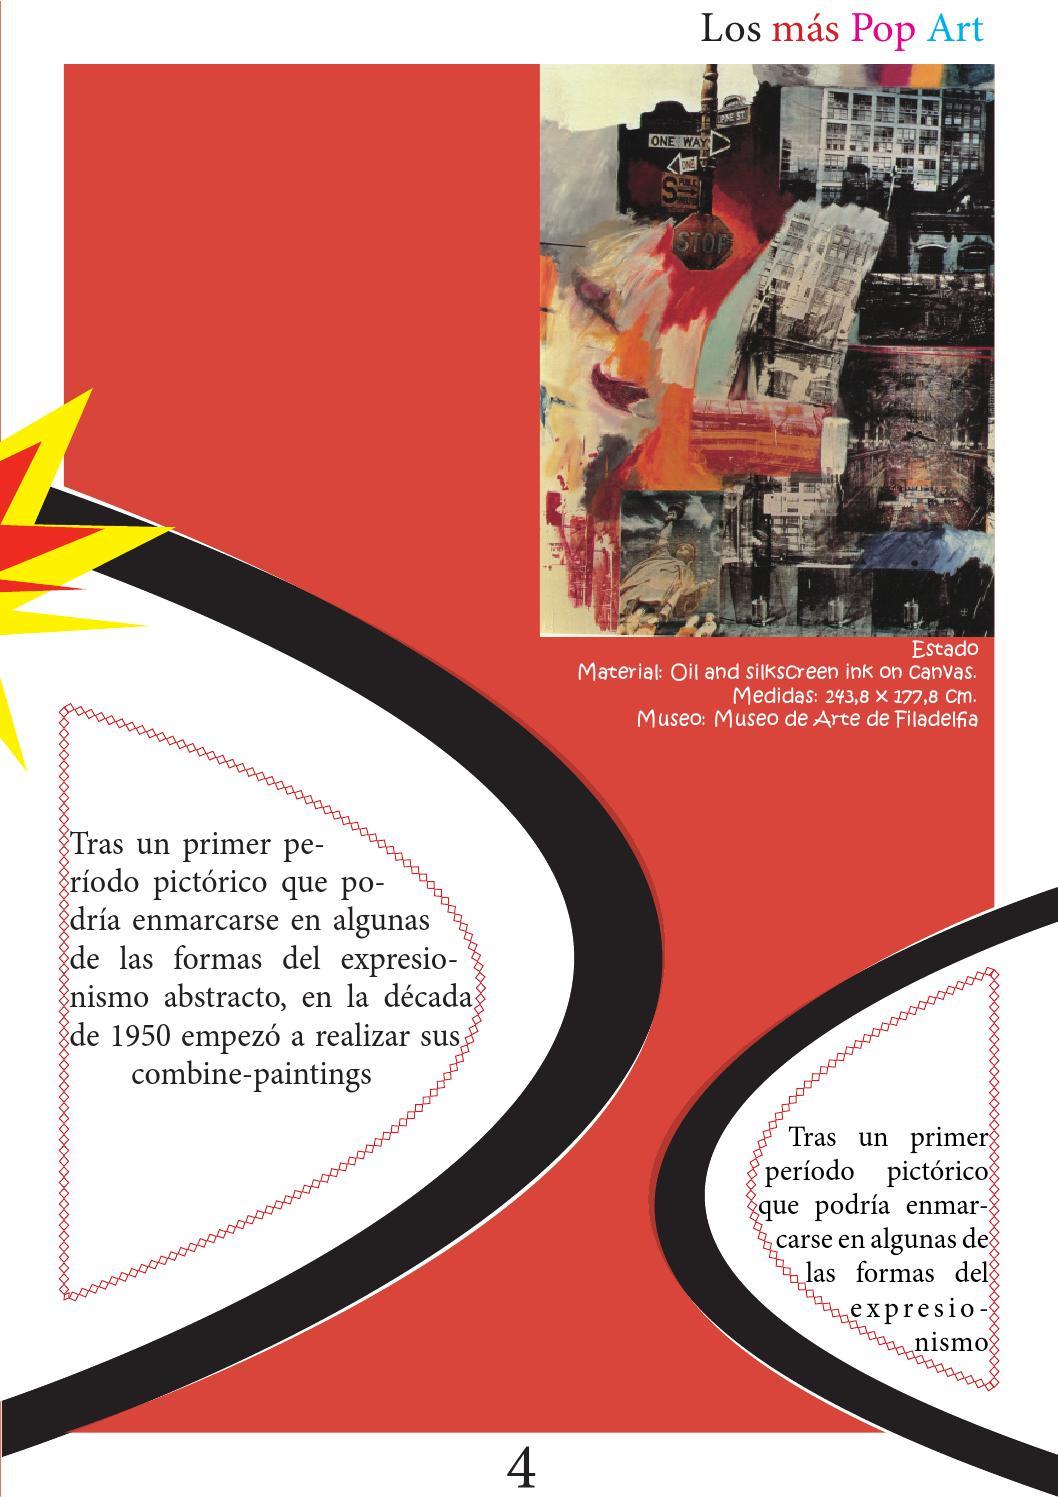 Los más Pop Art by Paula Andrea Ortiz P - issuu